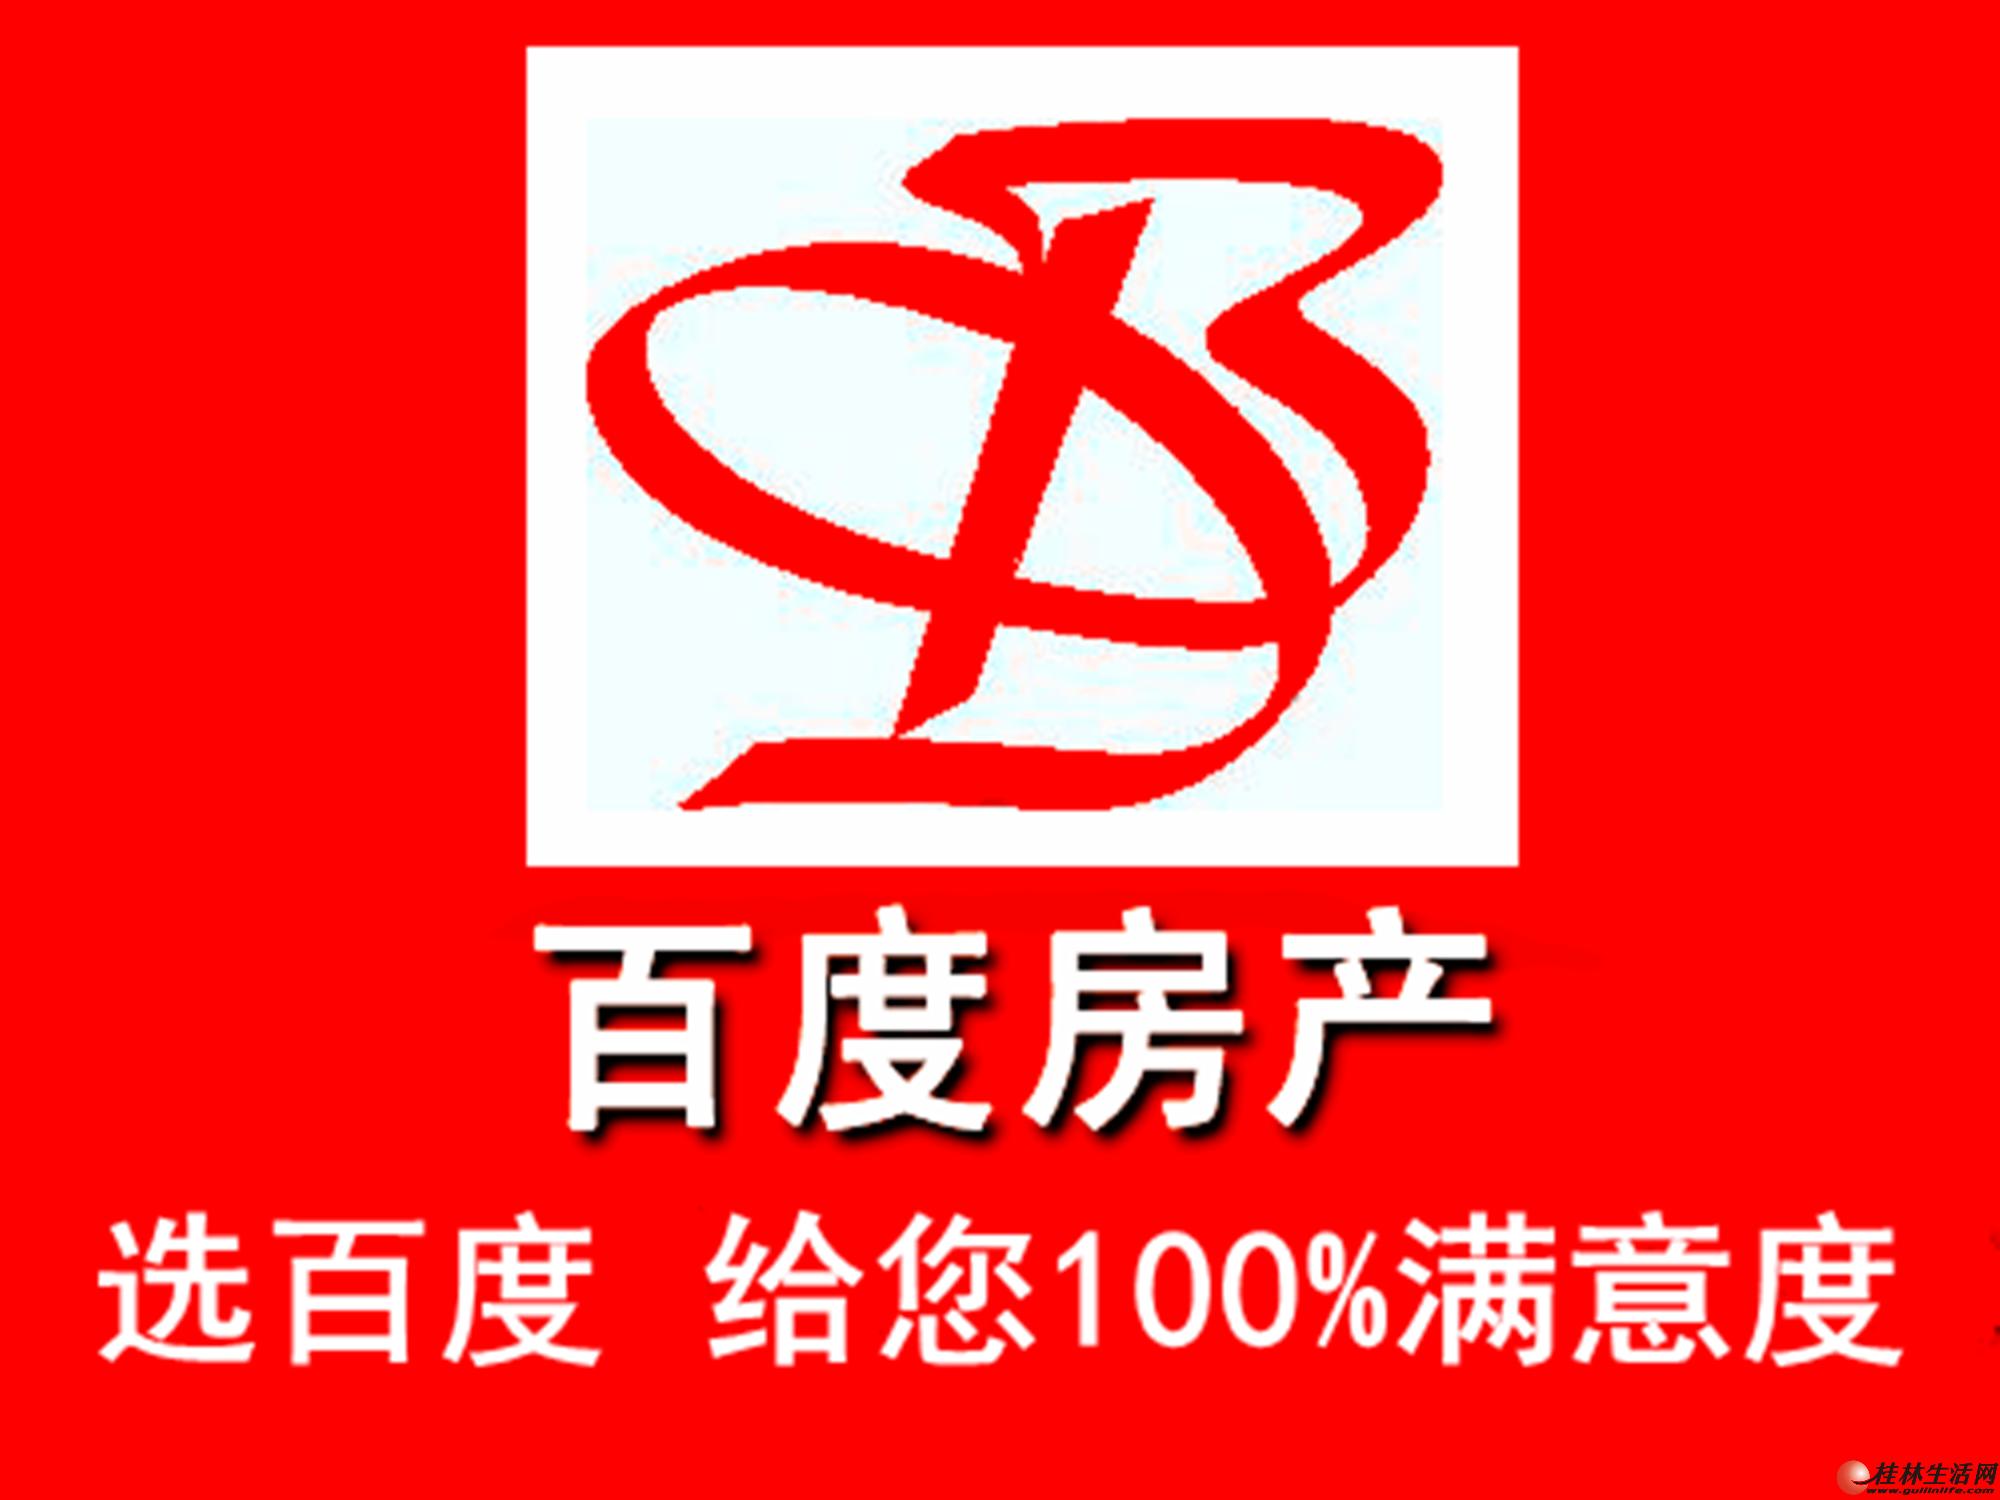 L虞山桥【玉龙花园】有物业 3房2厅2卫 118㎡ 仅售57万